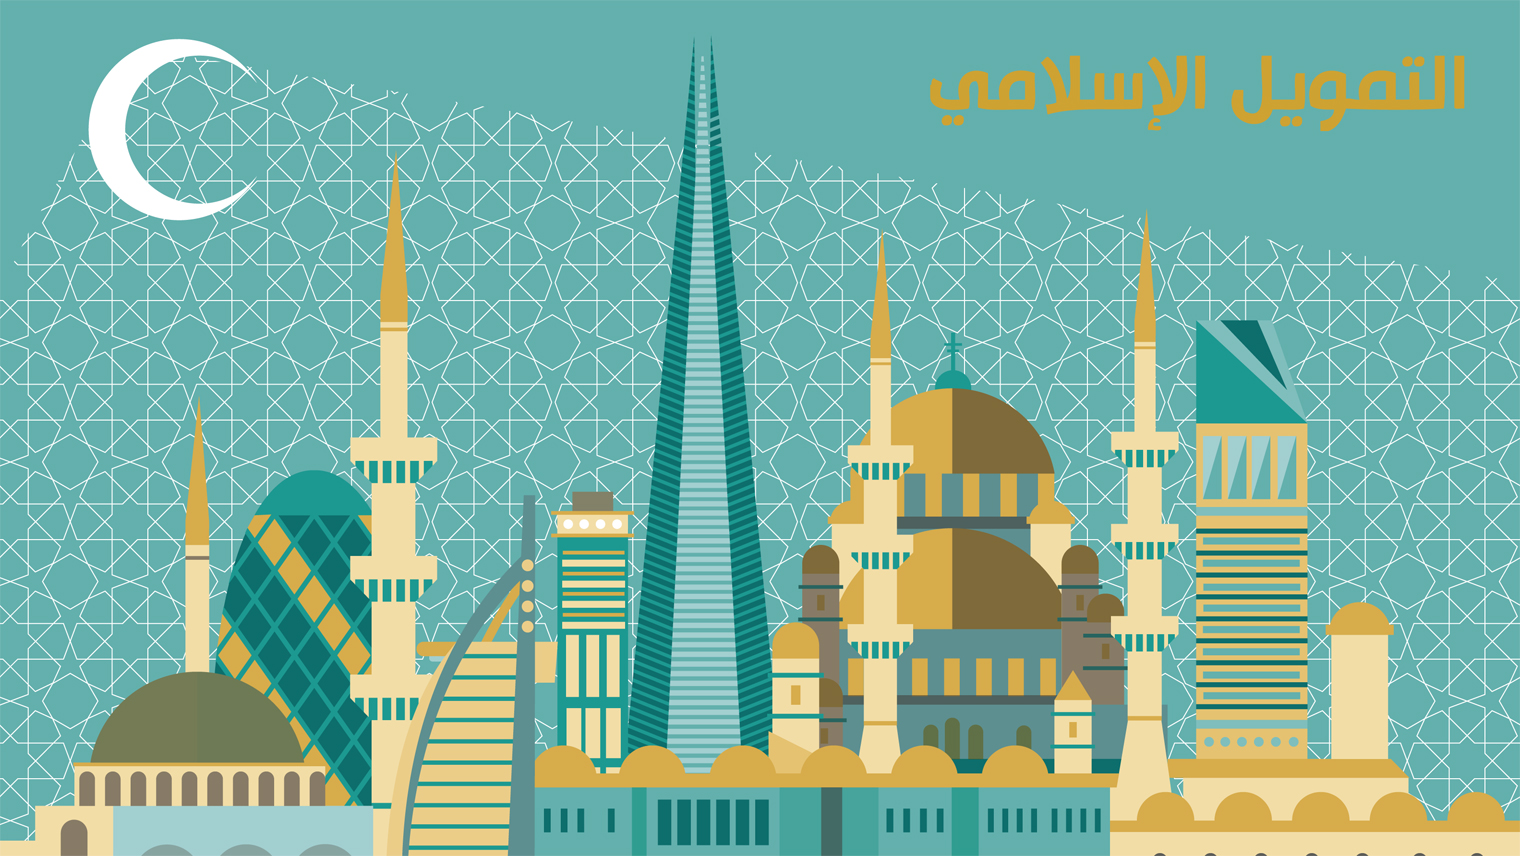 islamic finance cover economics business channel islamic finance cover